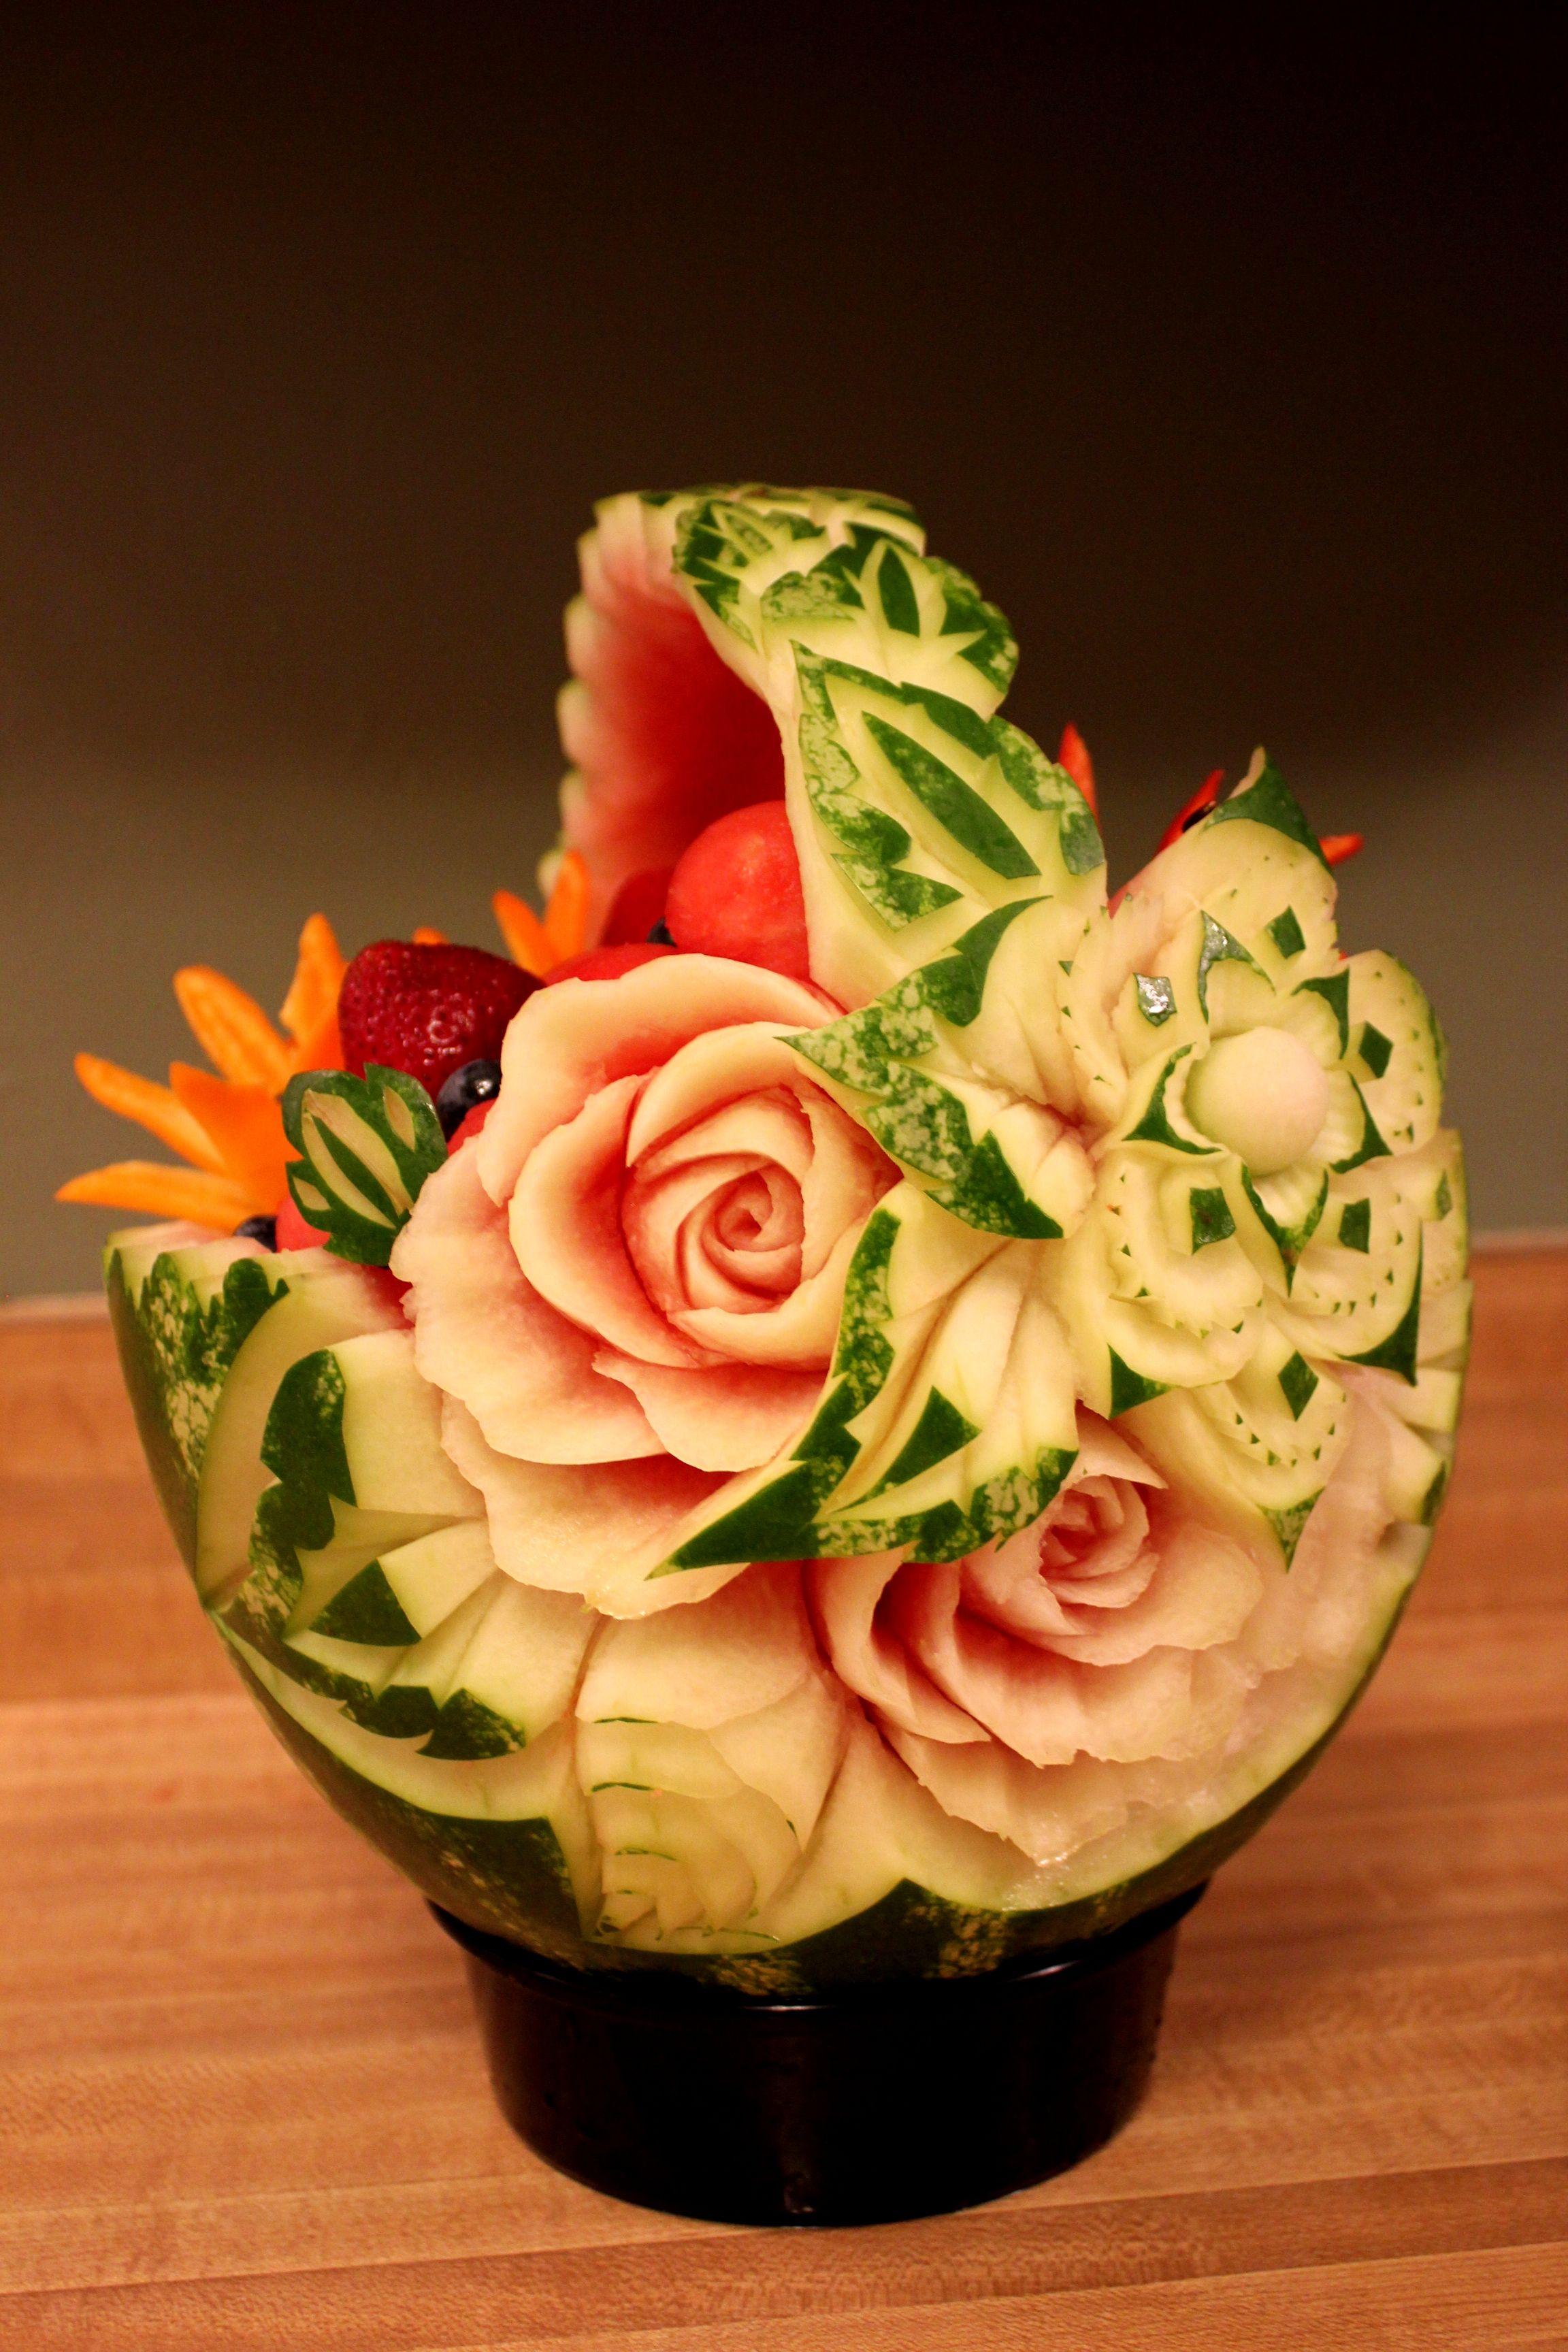 LEKAS - Basket - Floral